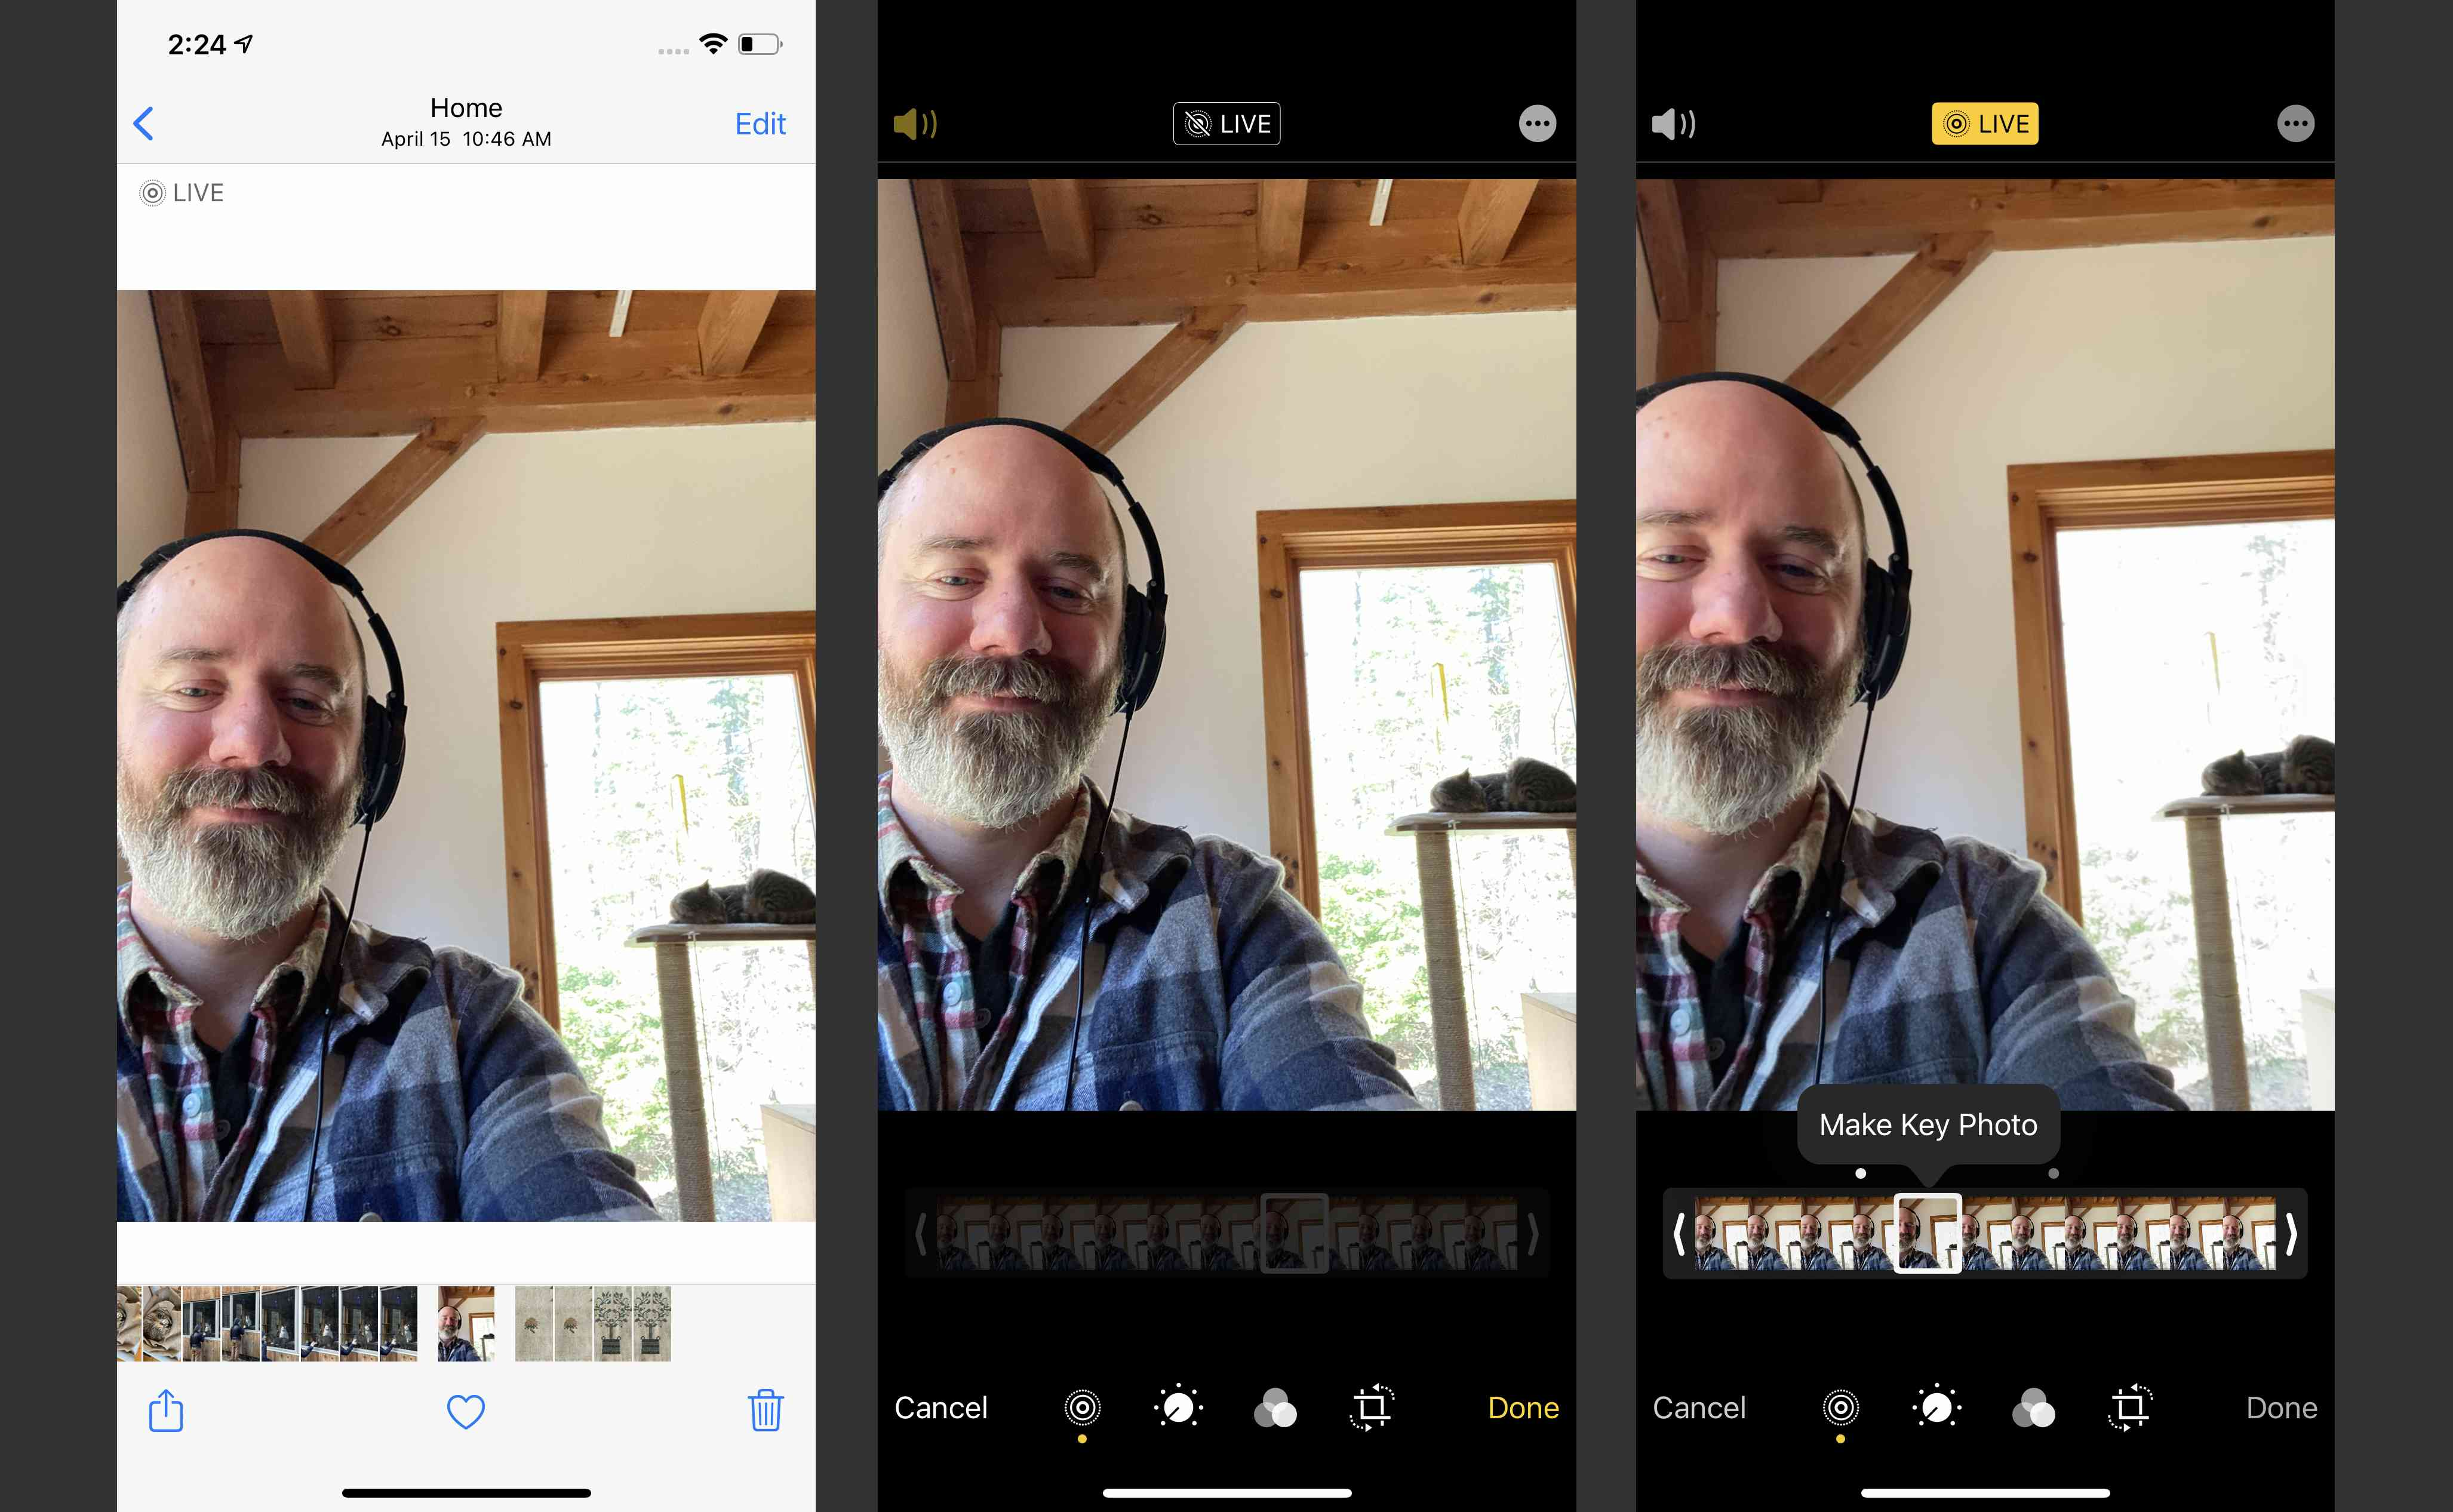 Screenshots of changing Live Photo Key Frame